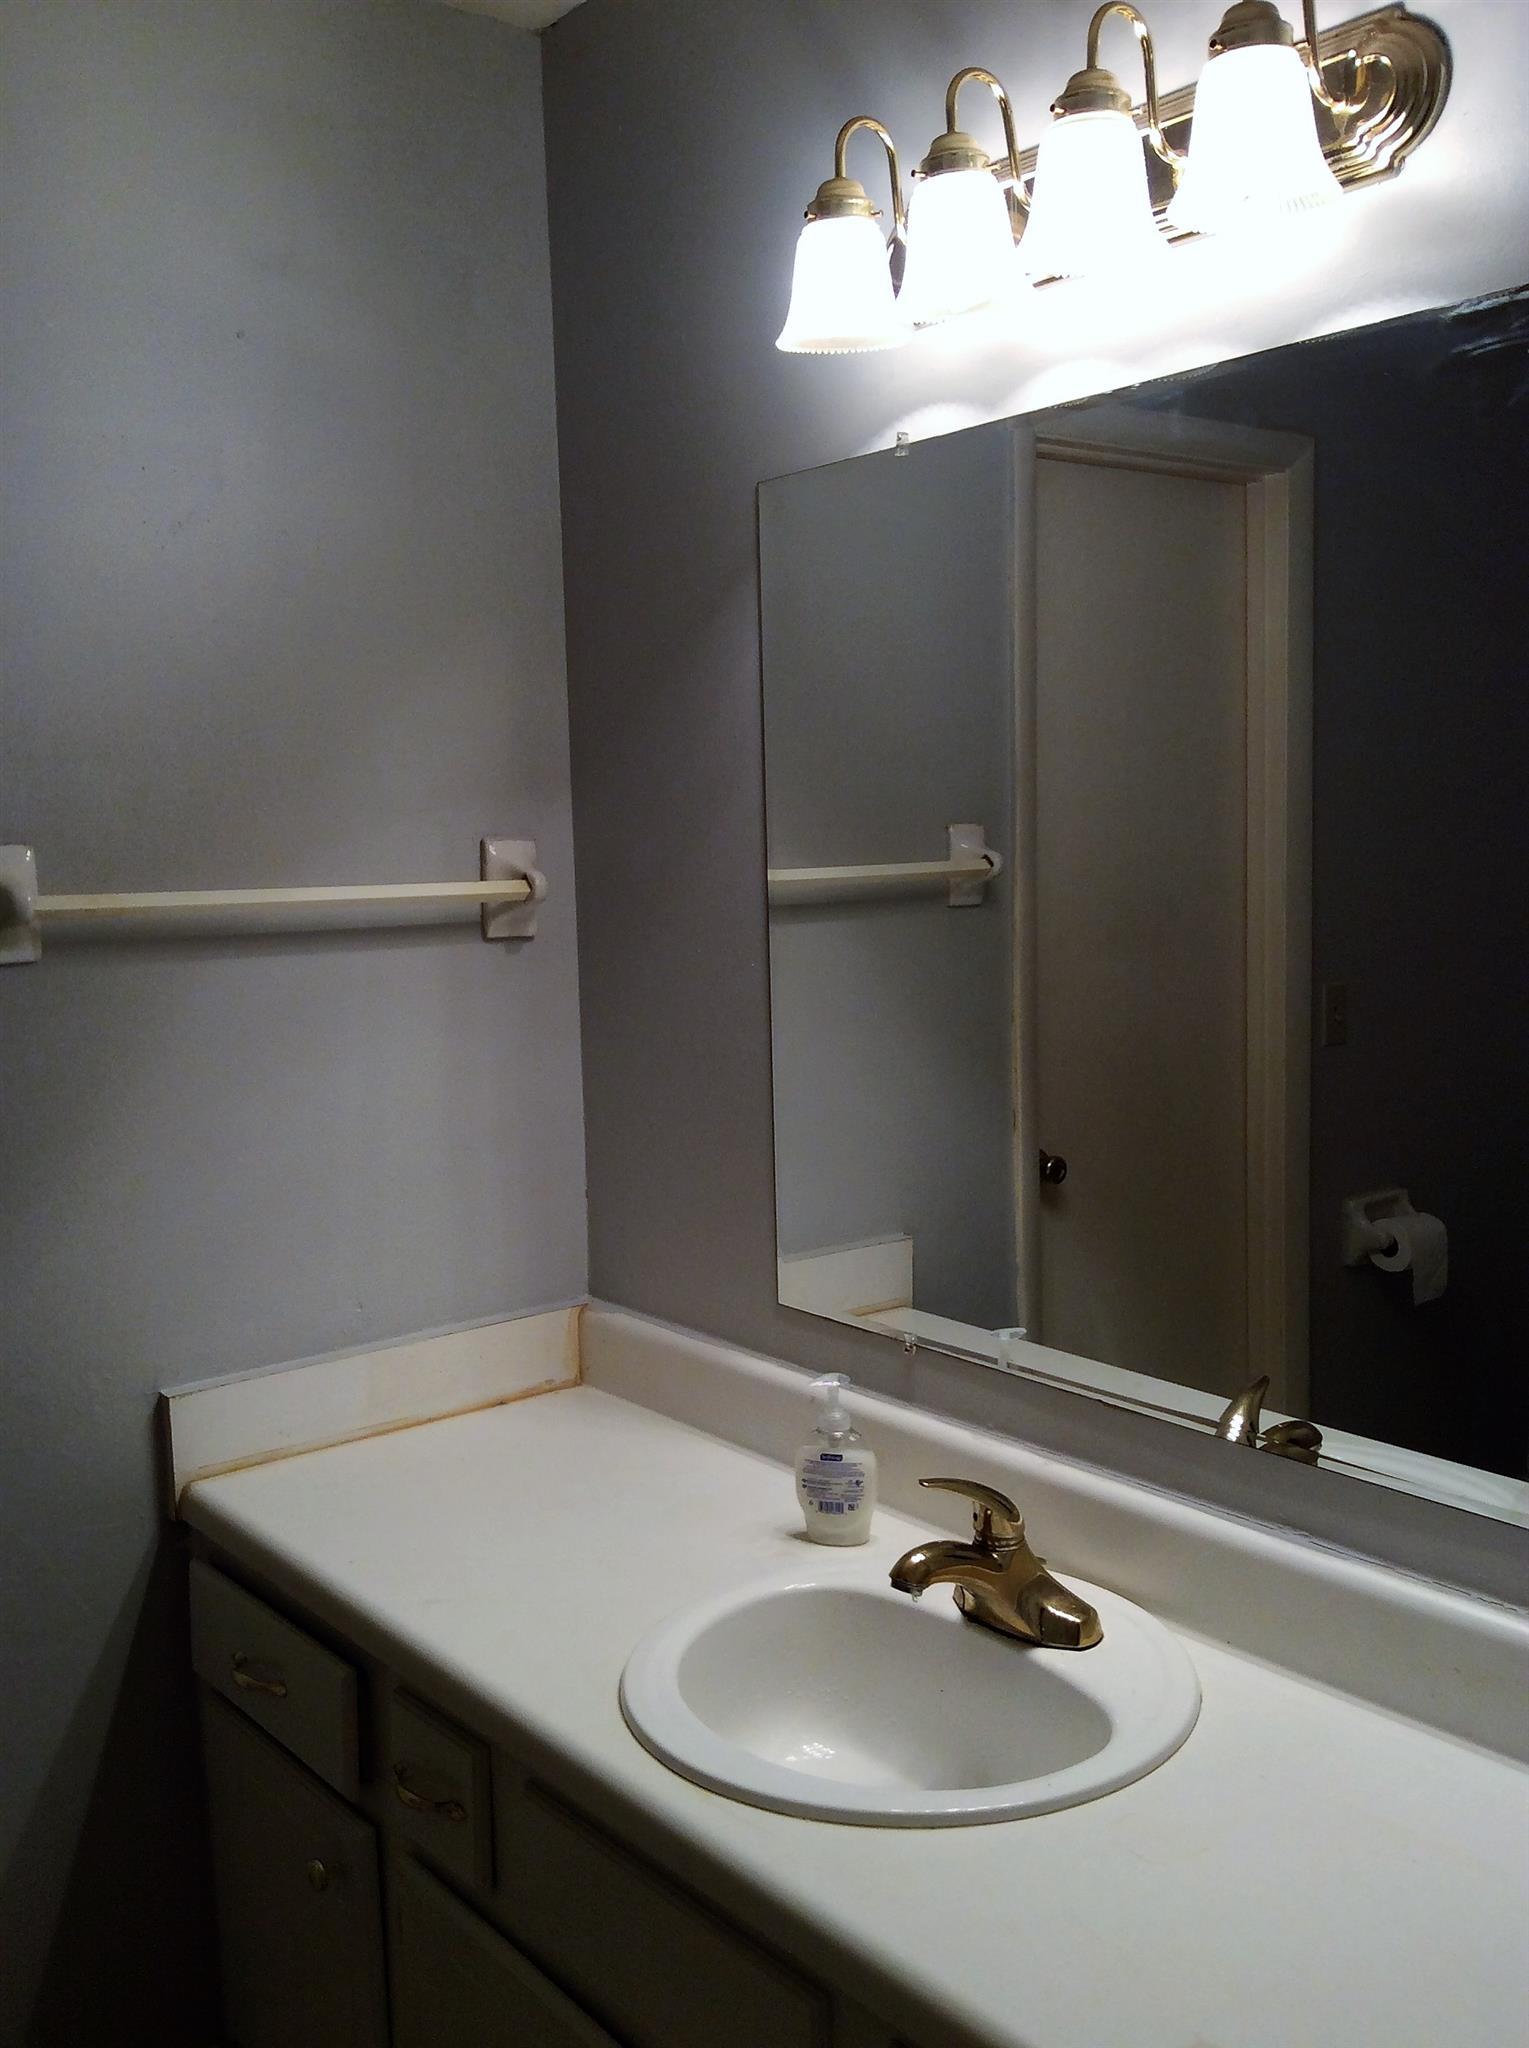 Bathroom Light Fixtures Nashville Tn 3728 creekland ct, nashville, tn 37218 mls# 1791345 - movoto